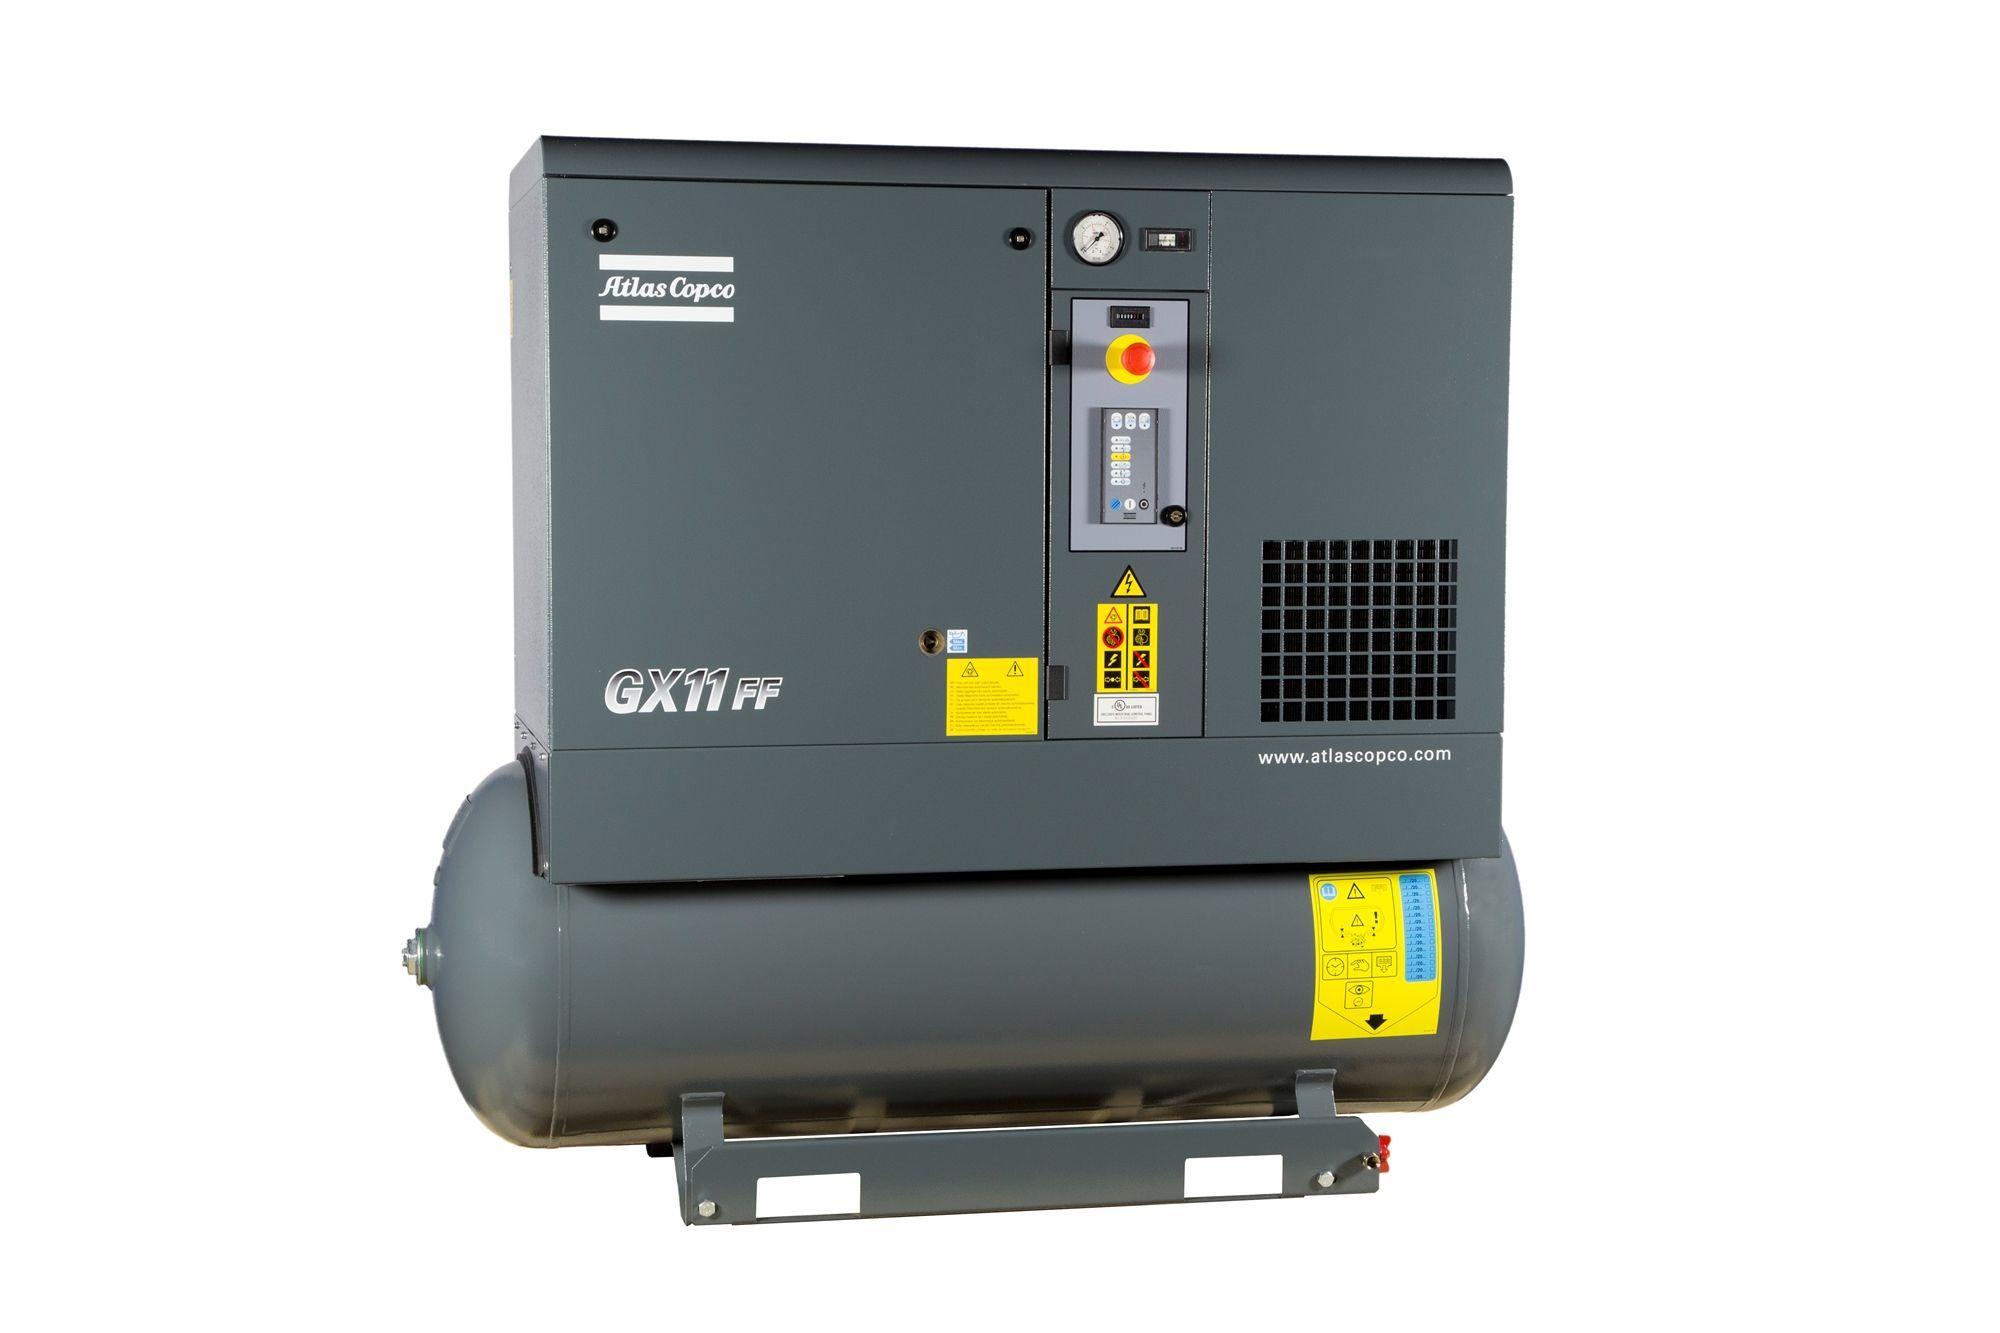 Atlas copco gx11 150t aff 15 hp rotary screw air compressors w dryer